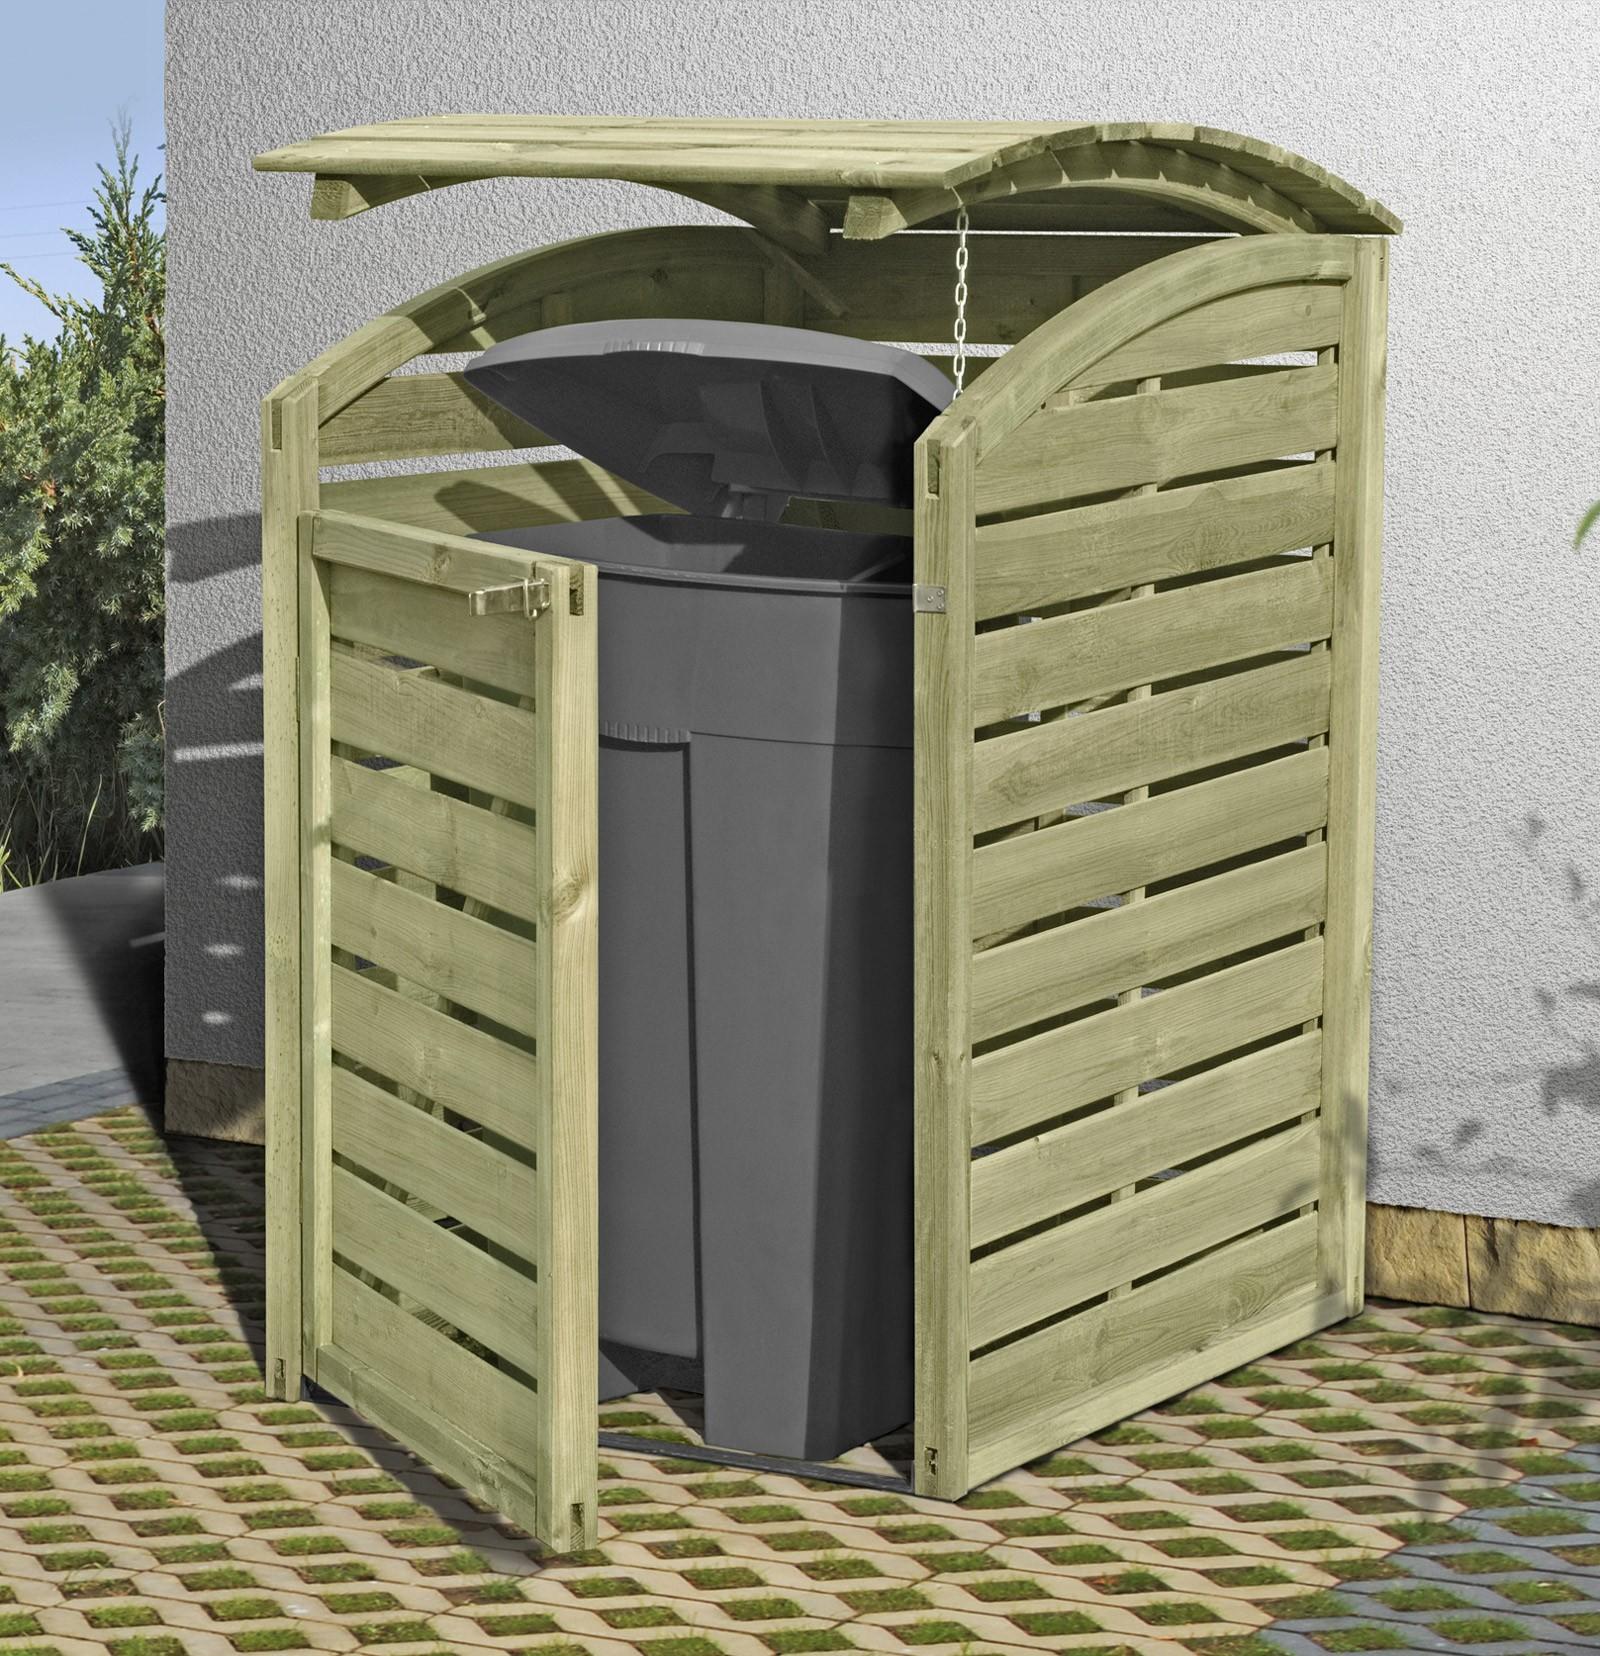 holz m lltonnenbox f r 1 x 240 liter m lltonne kdi bei. Black Bedroom Furniture Sets. Home Design Ideas